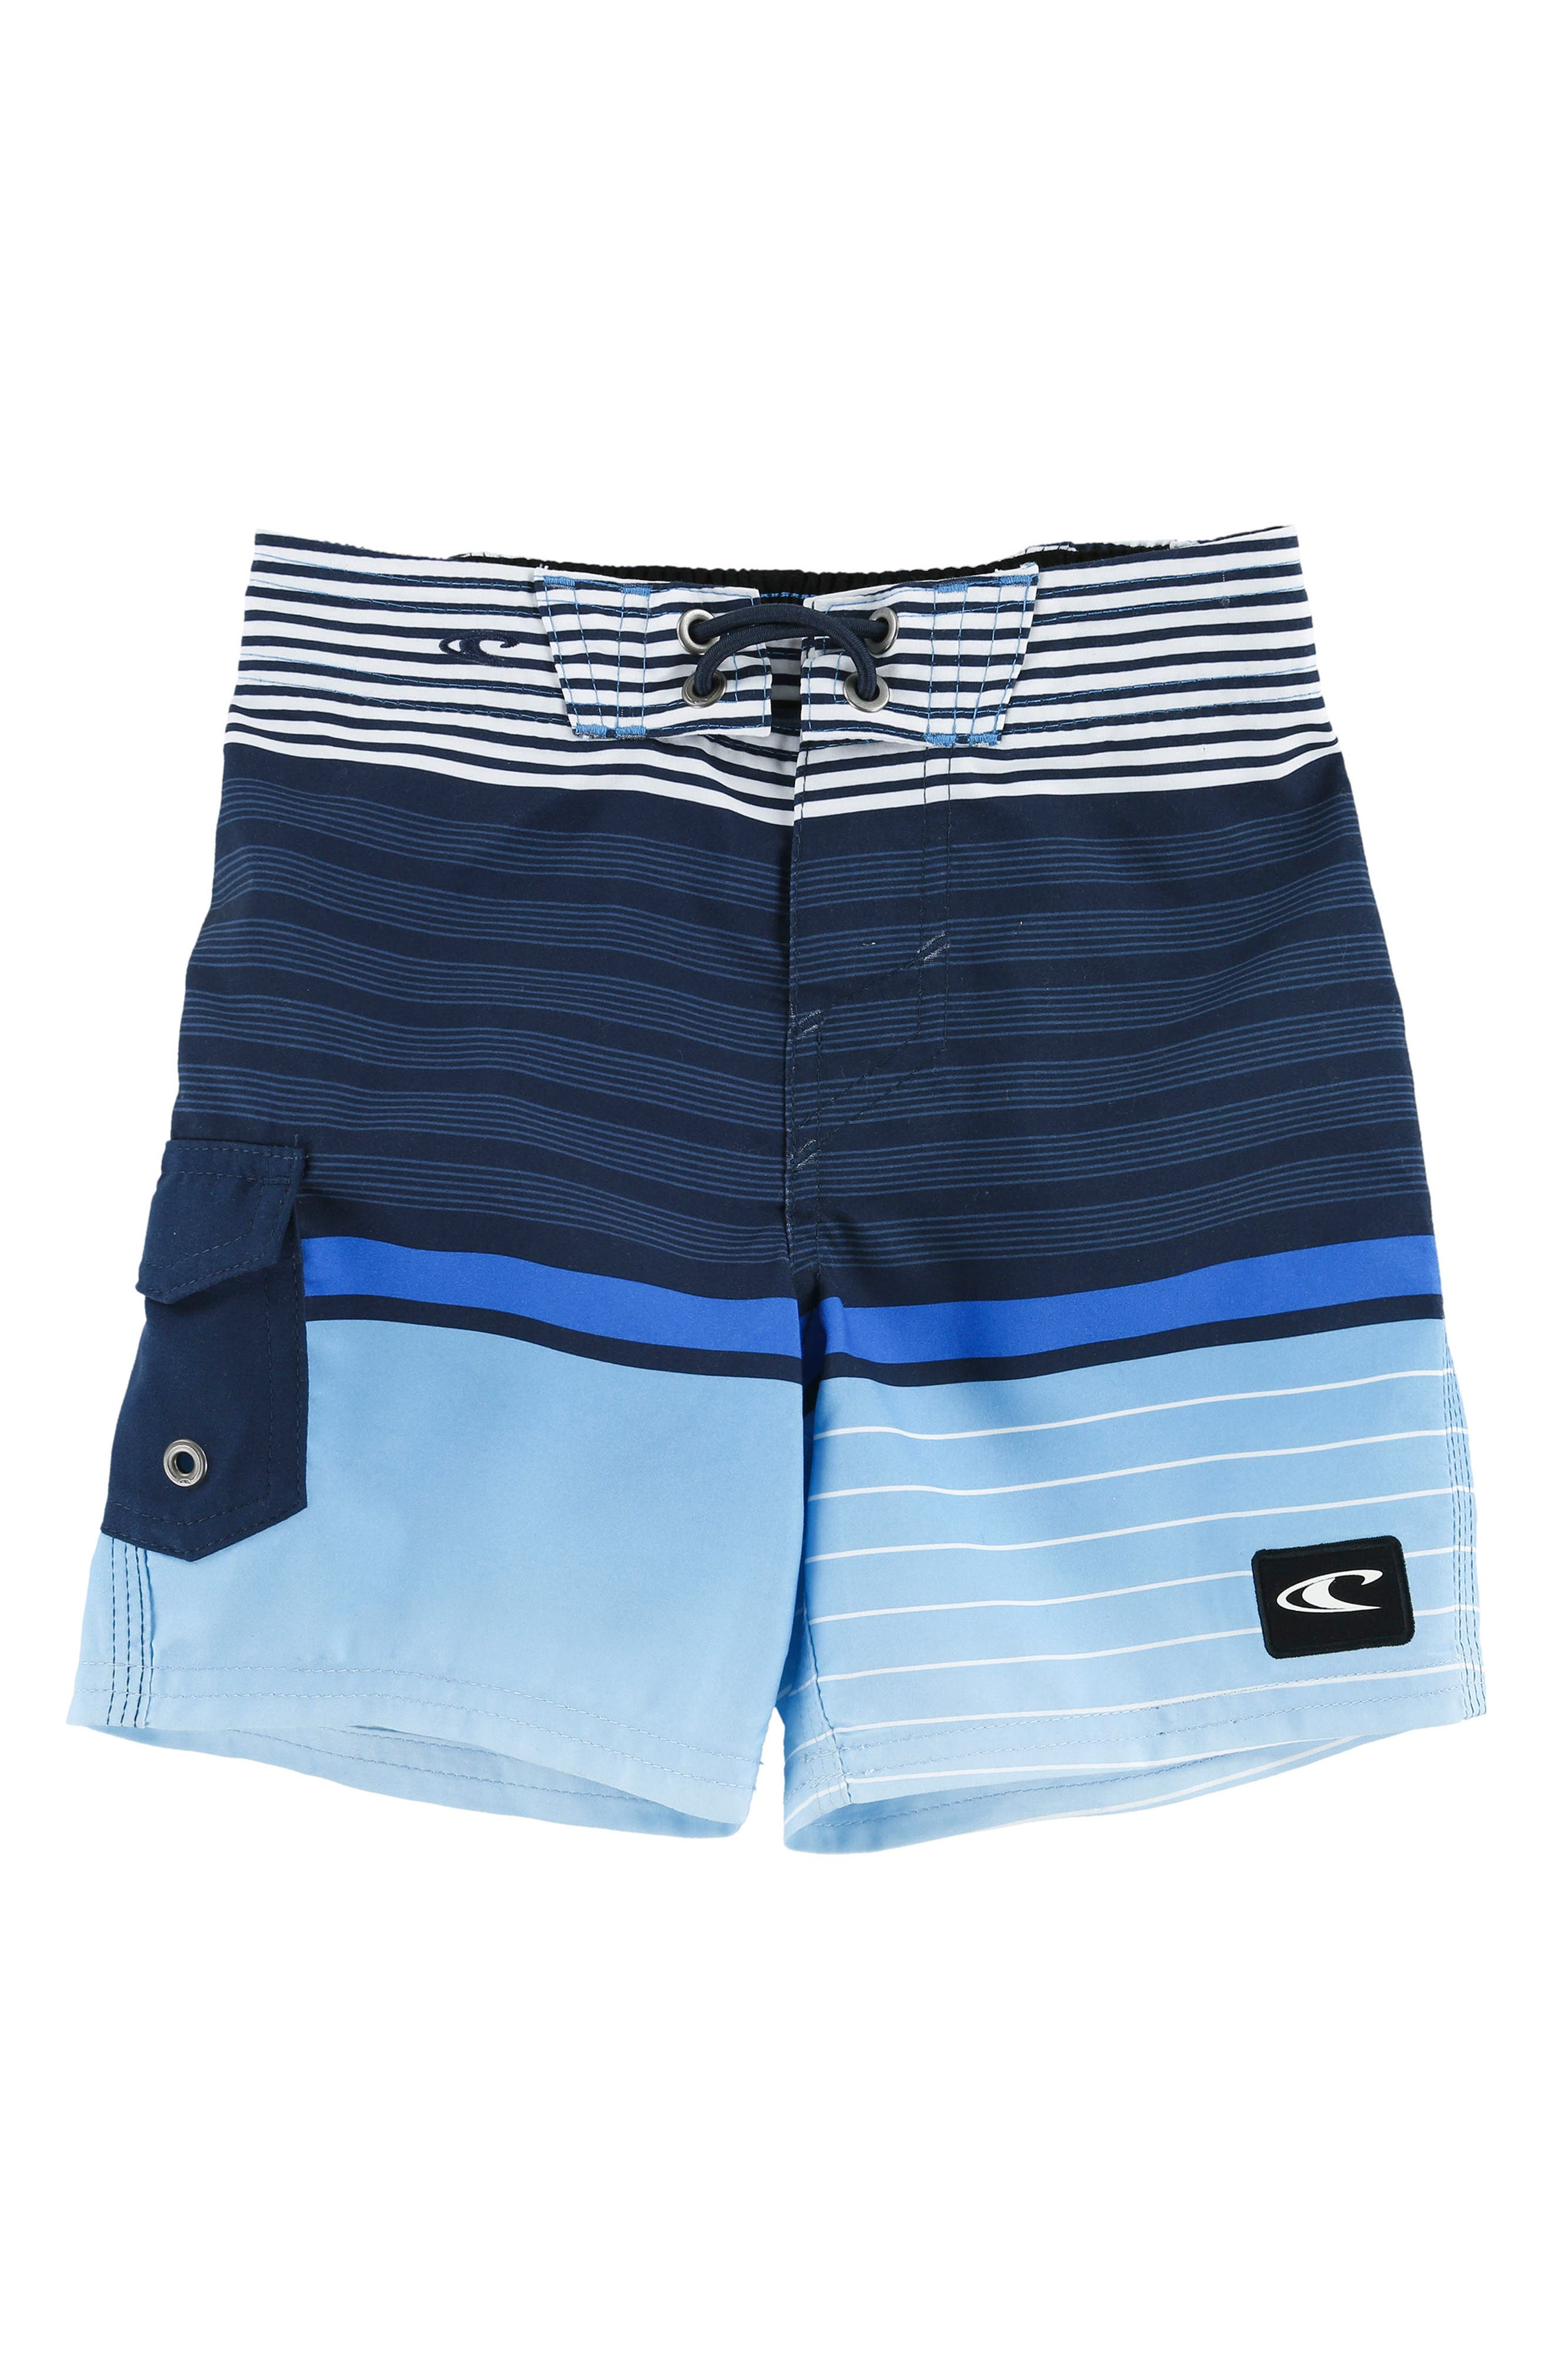 Lennox Stripe Board Shorts,                             Main thumbnail 1, color,                             Blue